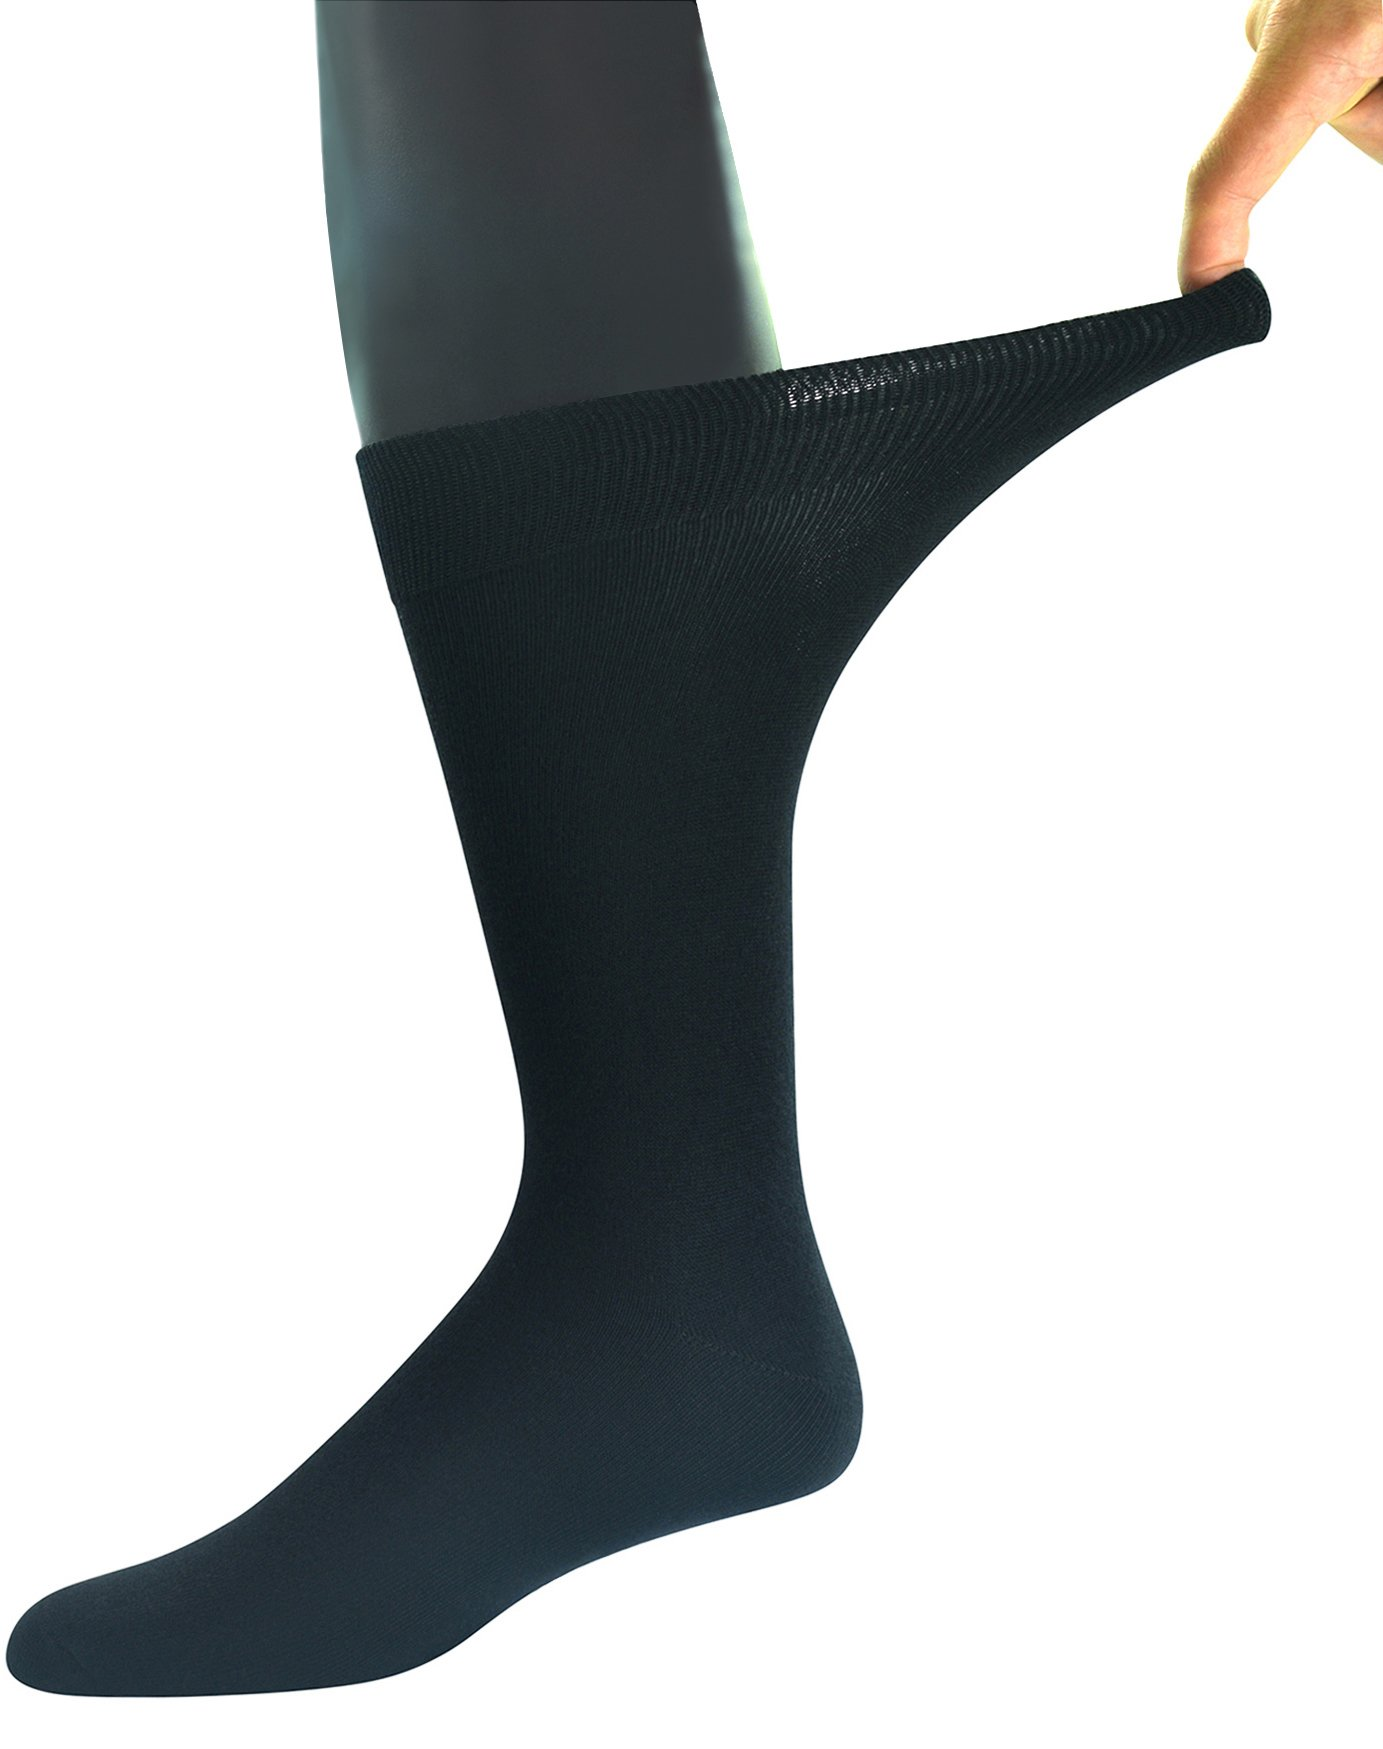 Yomandamor Men's 5 Pairs Bamboo Extra Wide Top Crew Dress Socks by Yomandamor (Image #2)